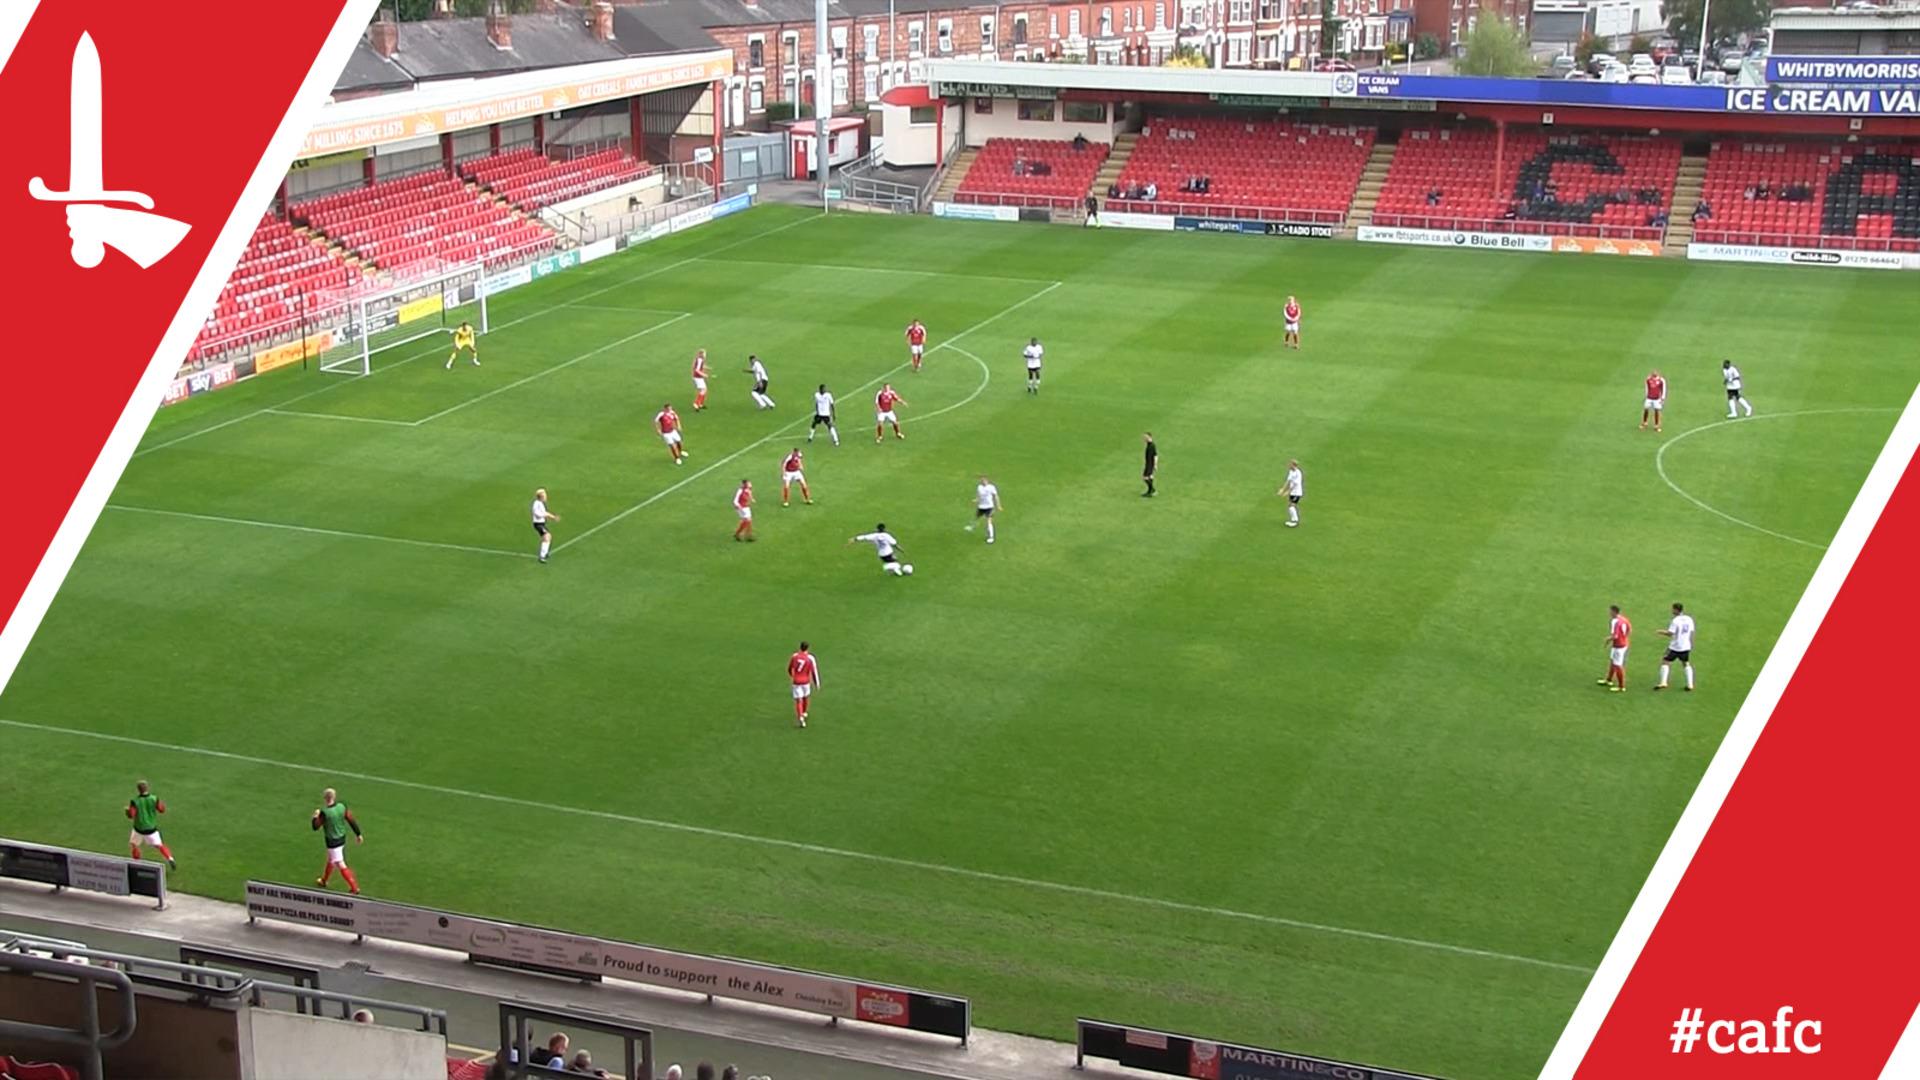 U23 HIGHLIGHTS | Crewe 1 Charlton 4